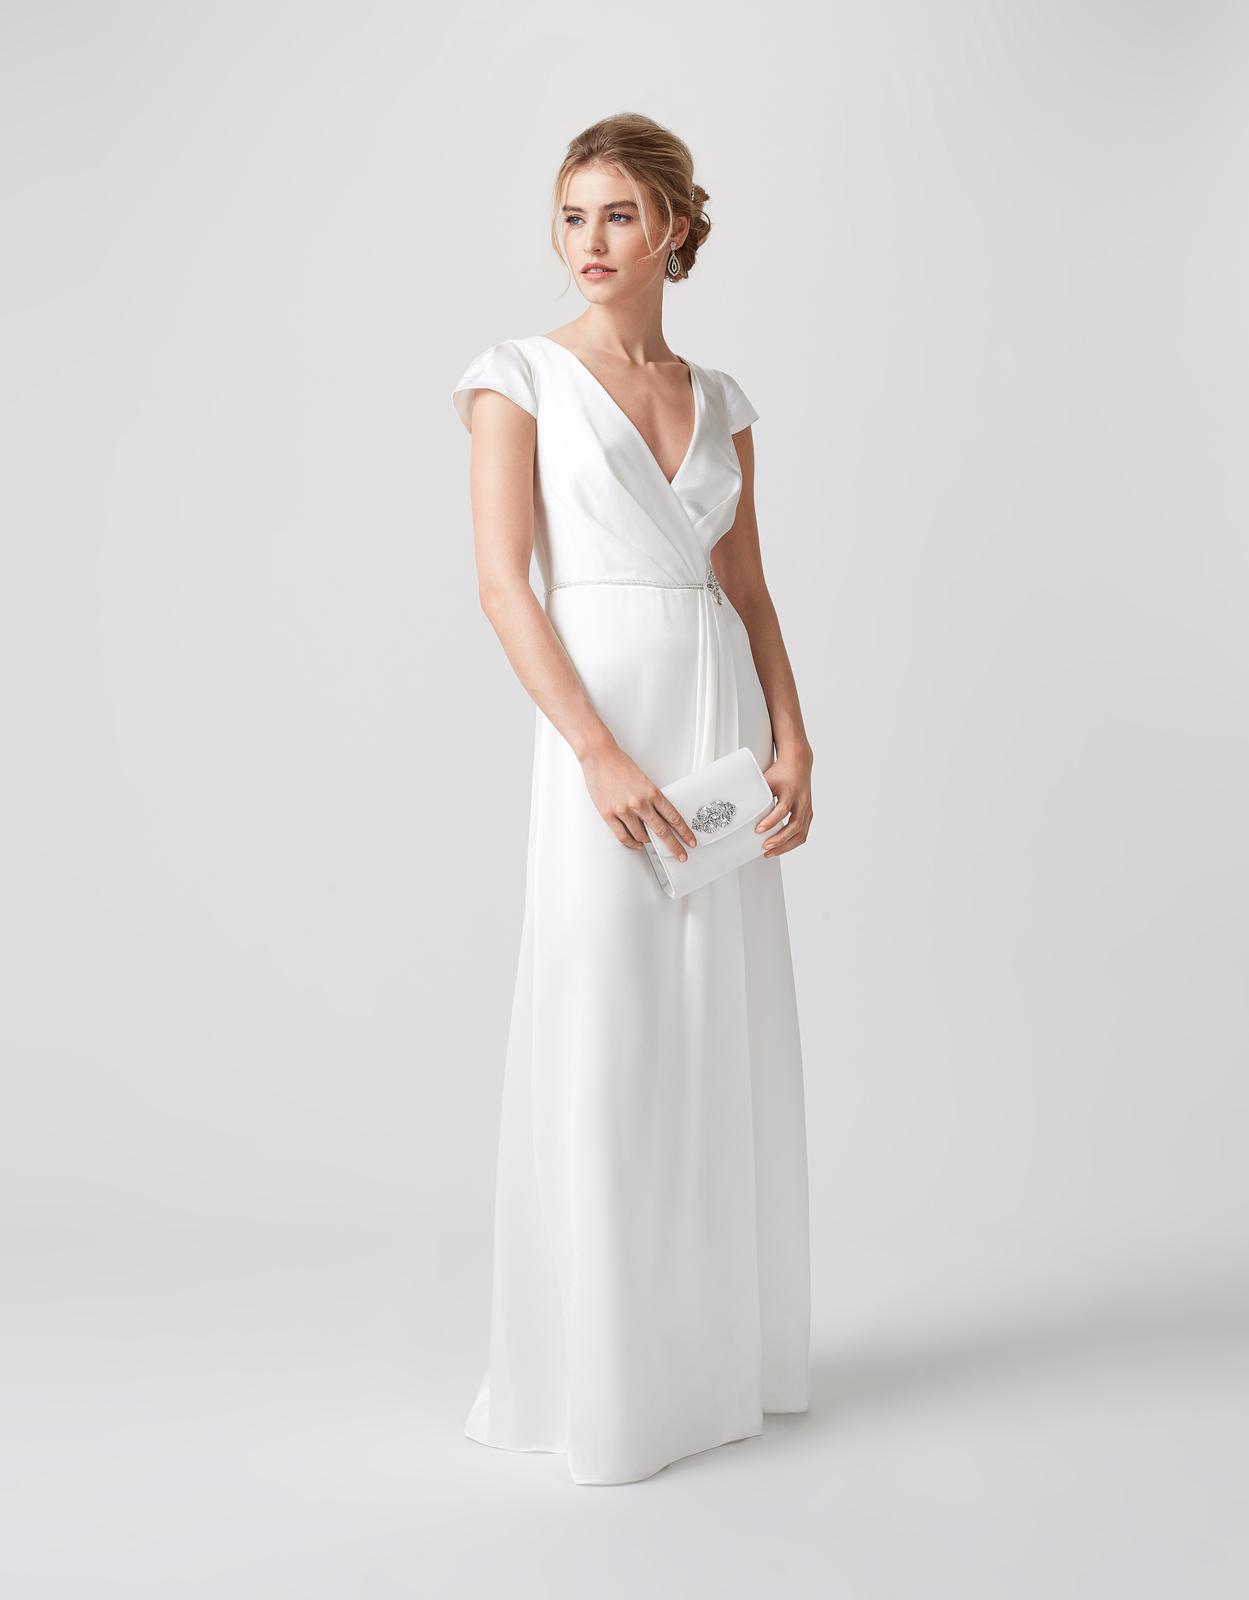 Vestidos de novia baratos - Blog de bodas originales para novias con ...